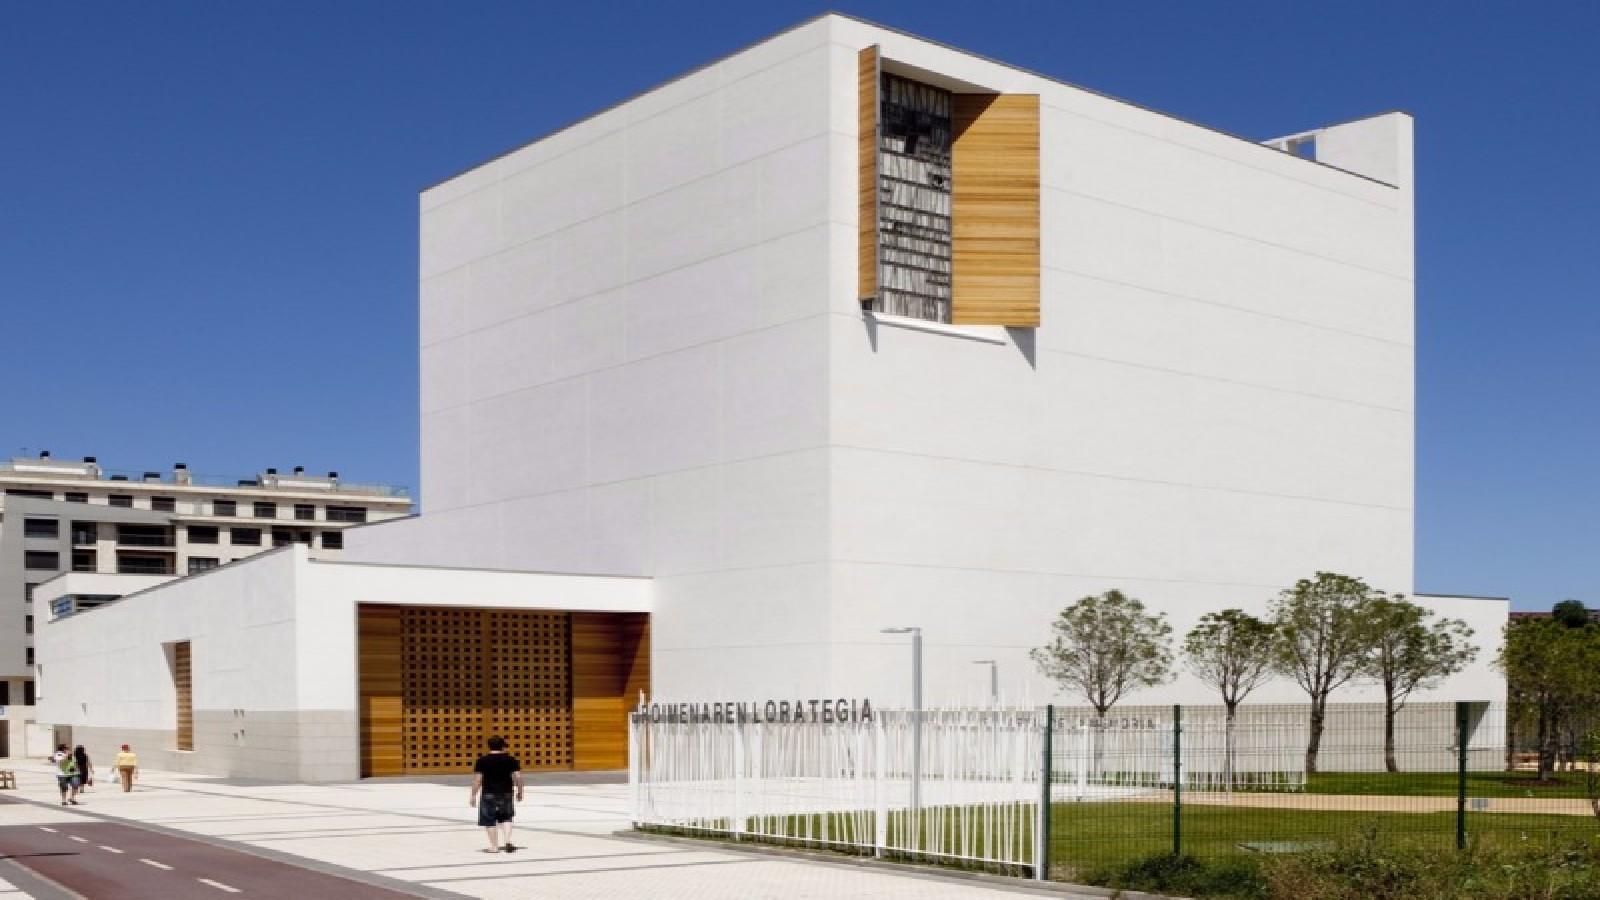 Moneo gana el premio internacional de arquitectura sacra for Arquitectura sacro